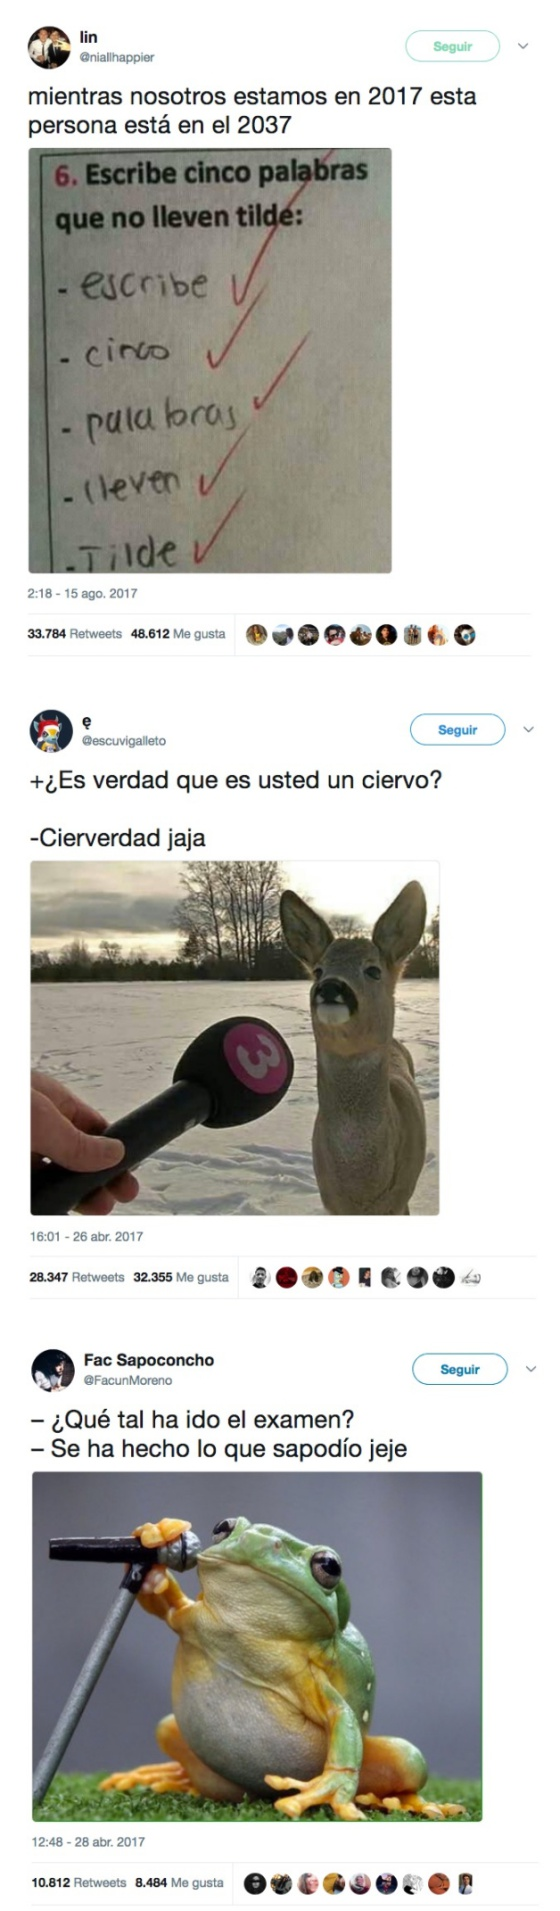 Fuentes: http:cort.as-0Wbg, http:cort.as-0Wbk, http:cort.as-0Wbu